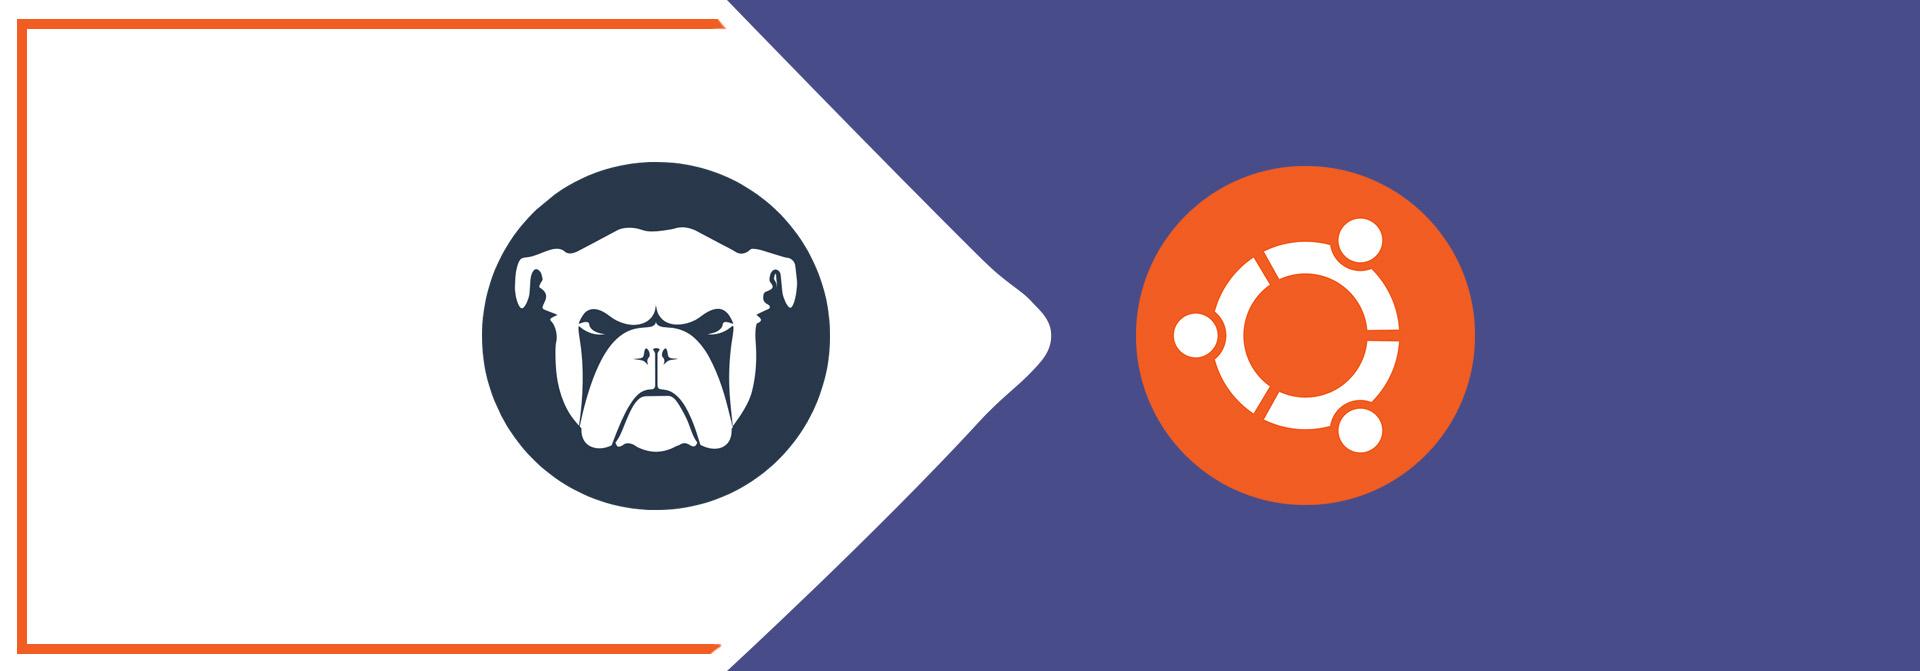 Configure Monit For MySQL, Apache, NGINX On Ubuntu 20.04 LTS